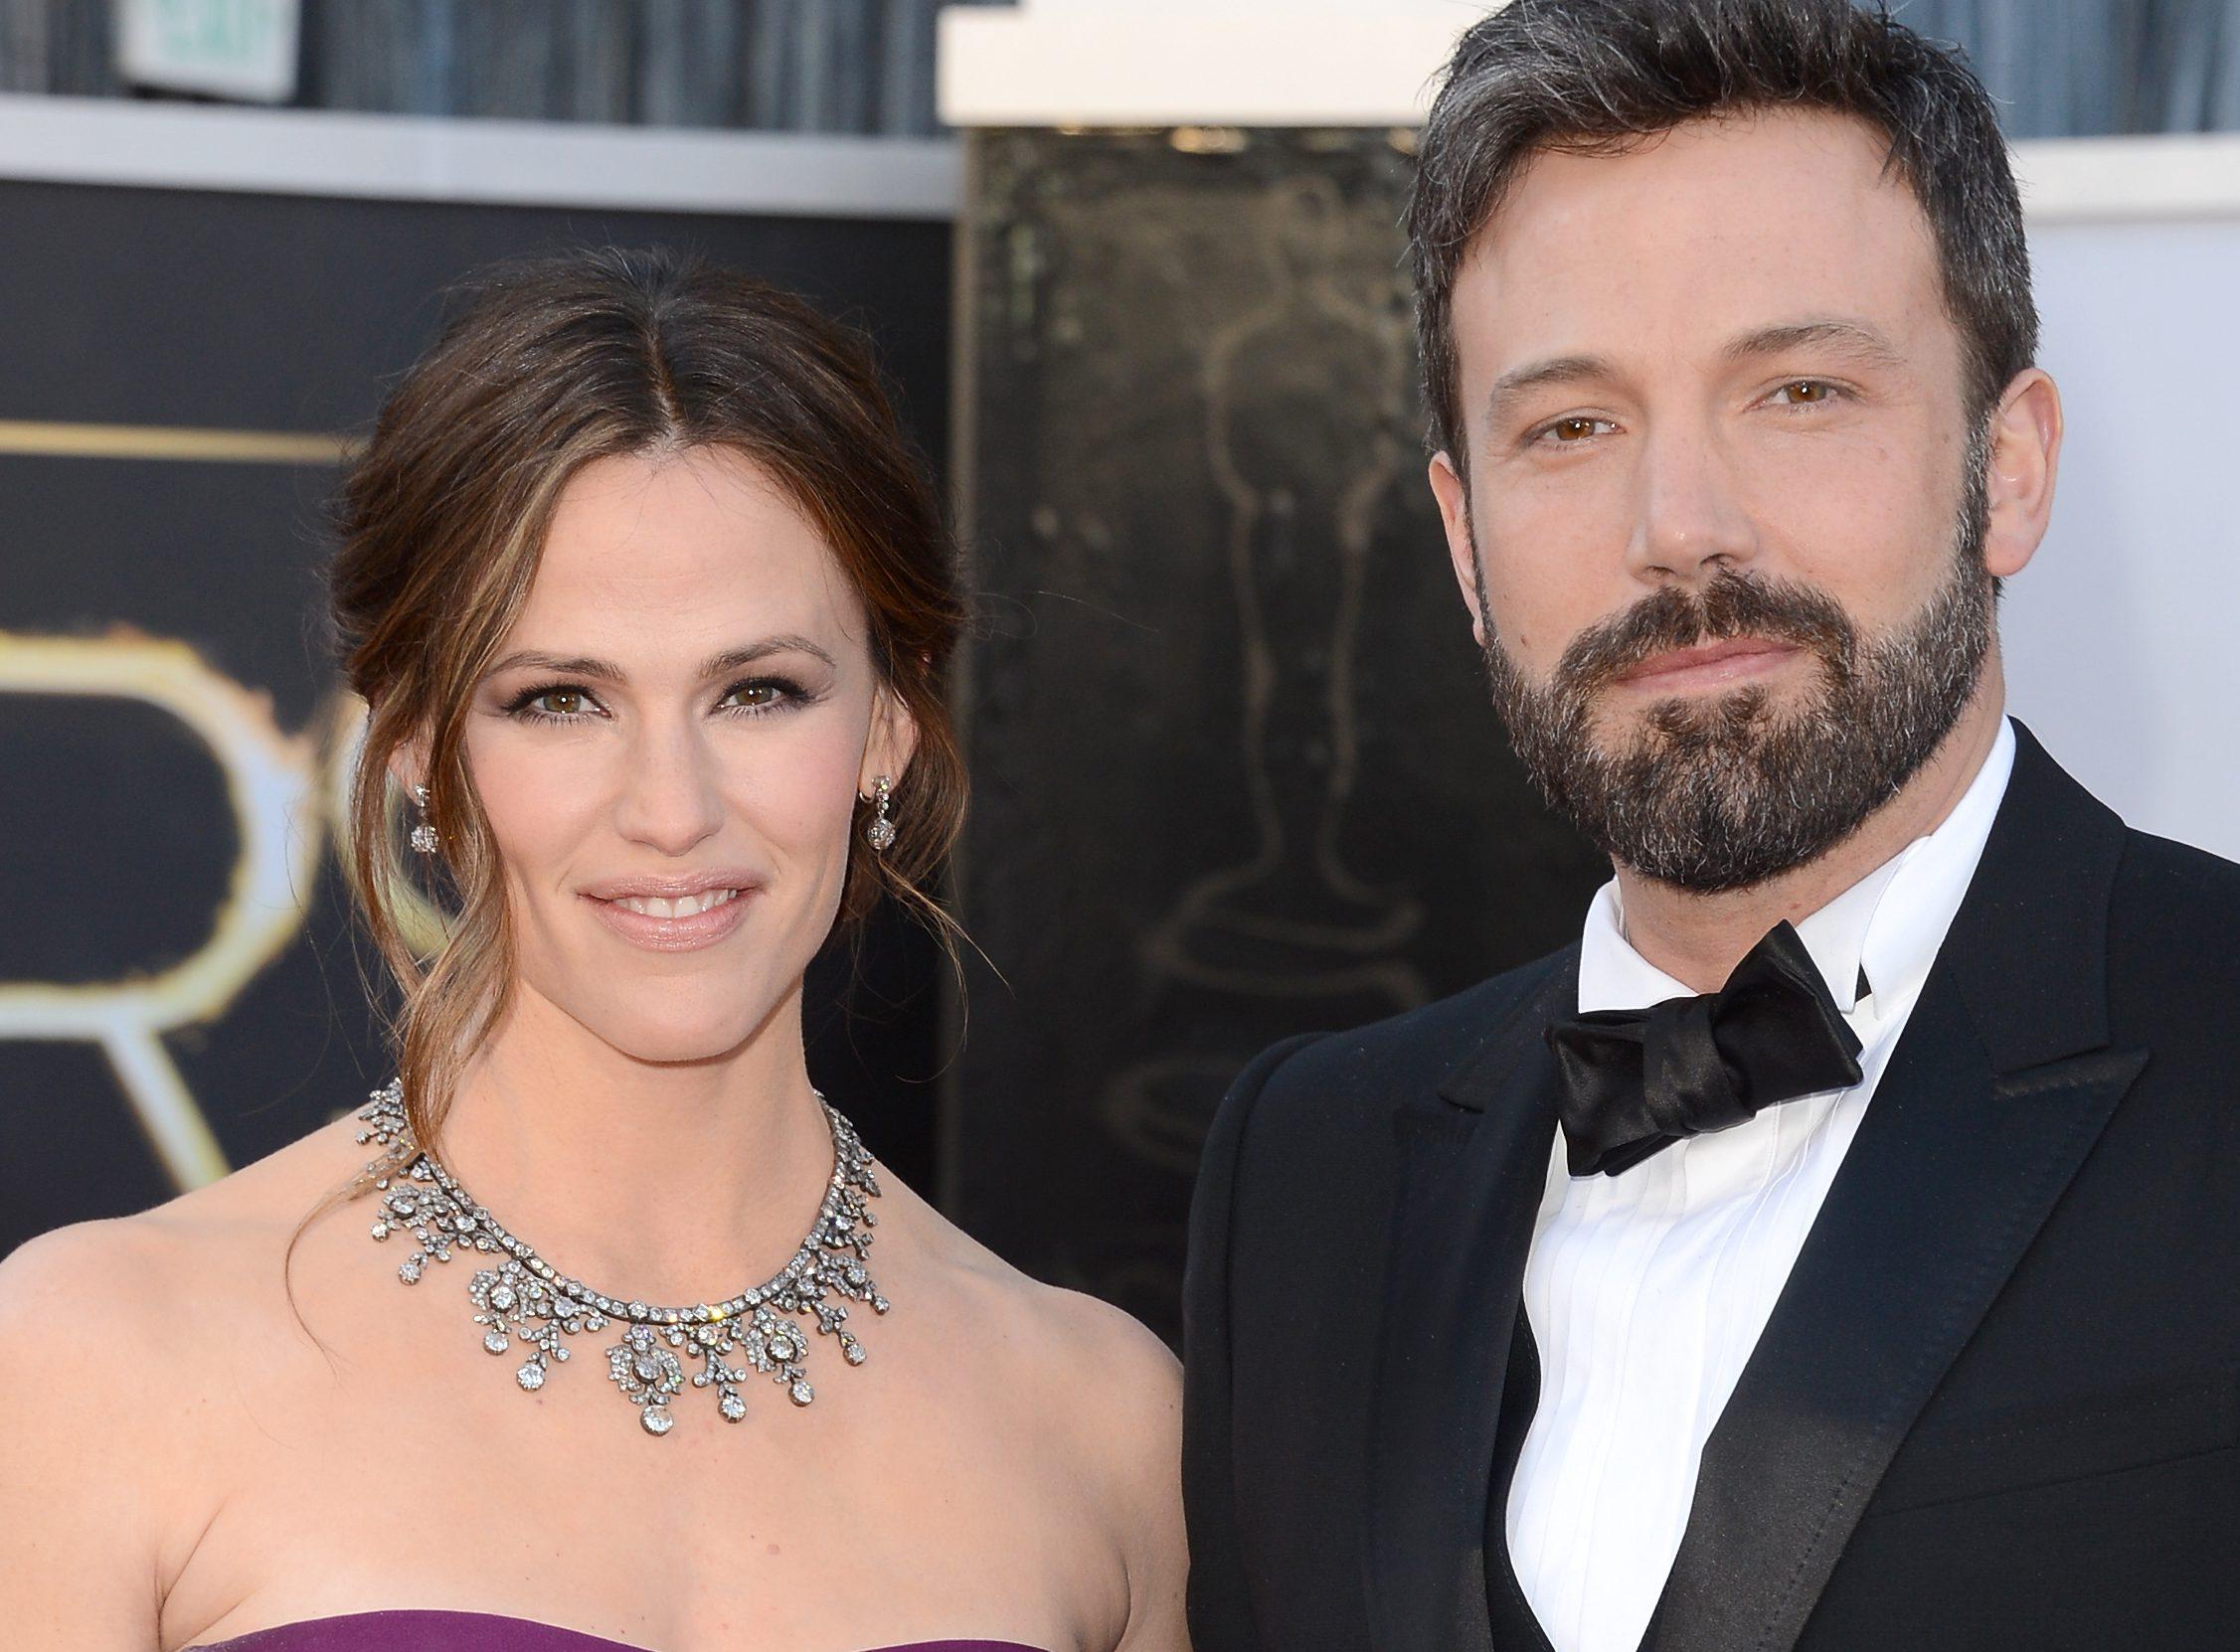 Ben Affleck and Jennifer Garner finalise divorce after actor says he 'fighting for his family'